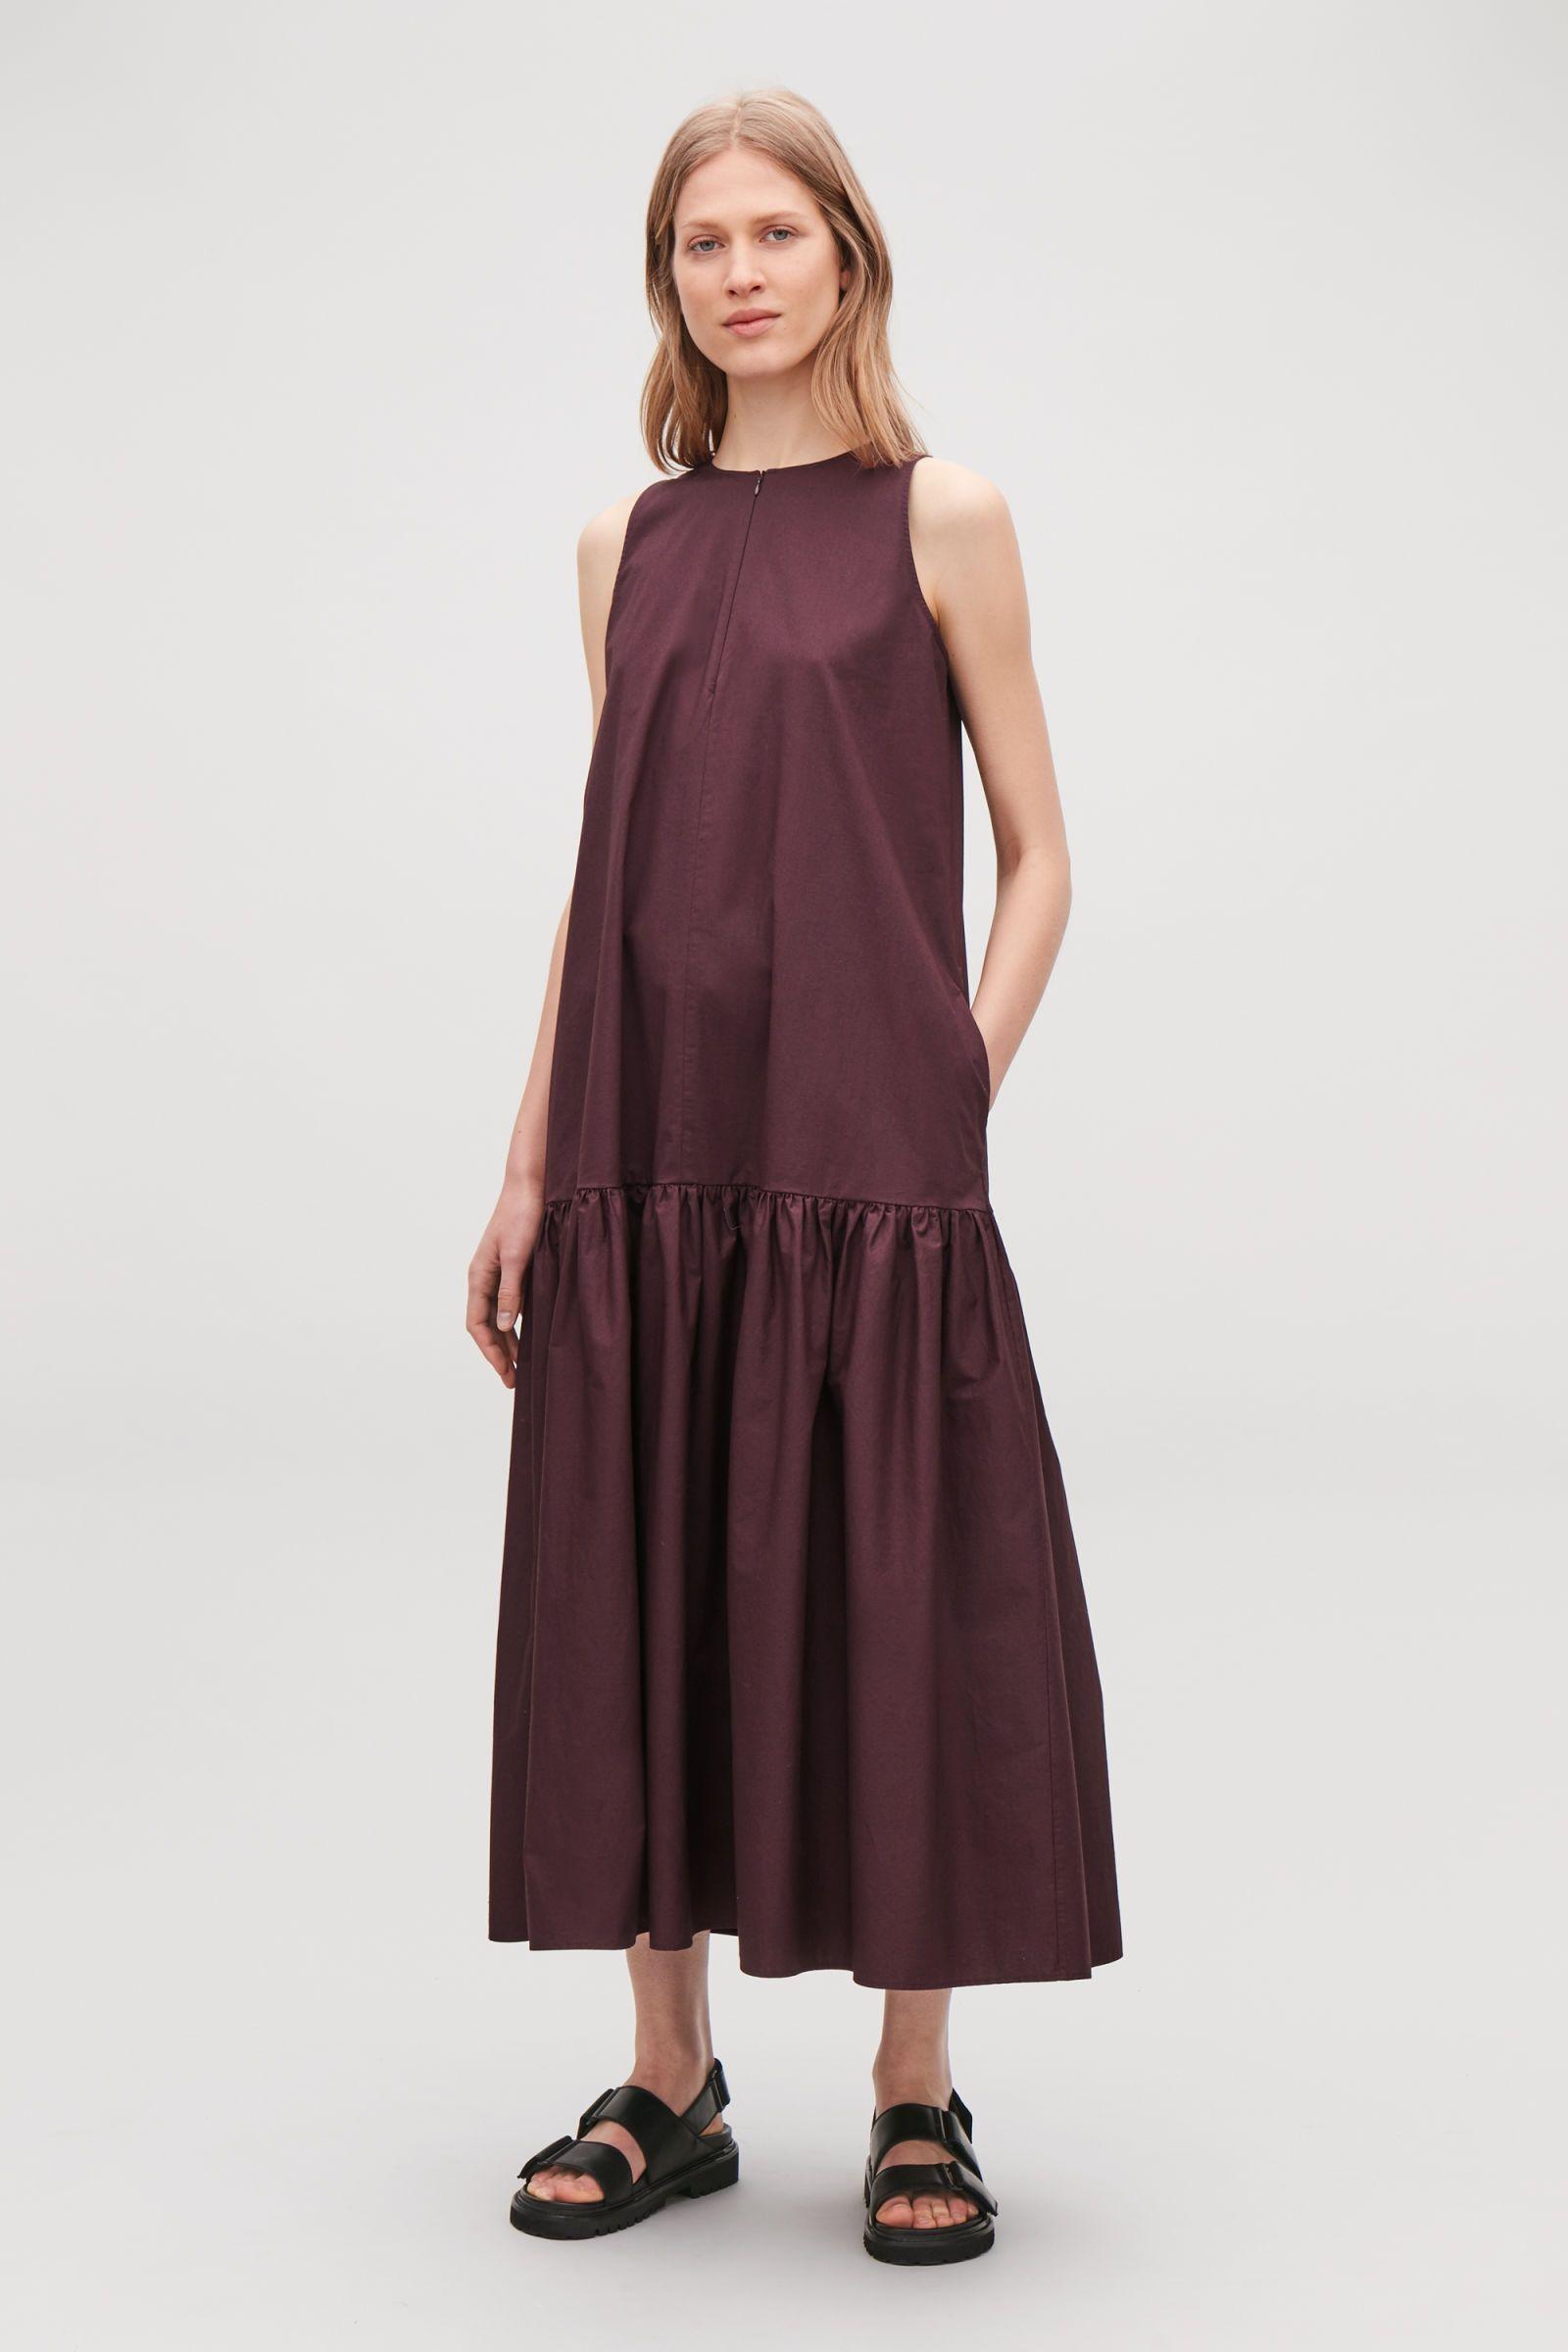 Cos _ gathered aline sleeveless dress burgundy